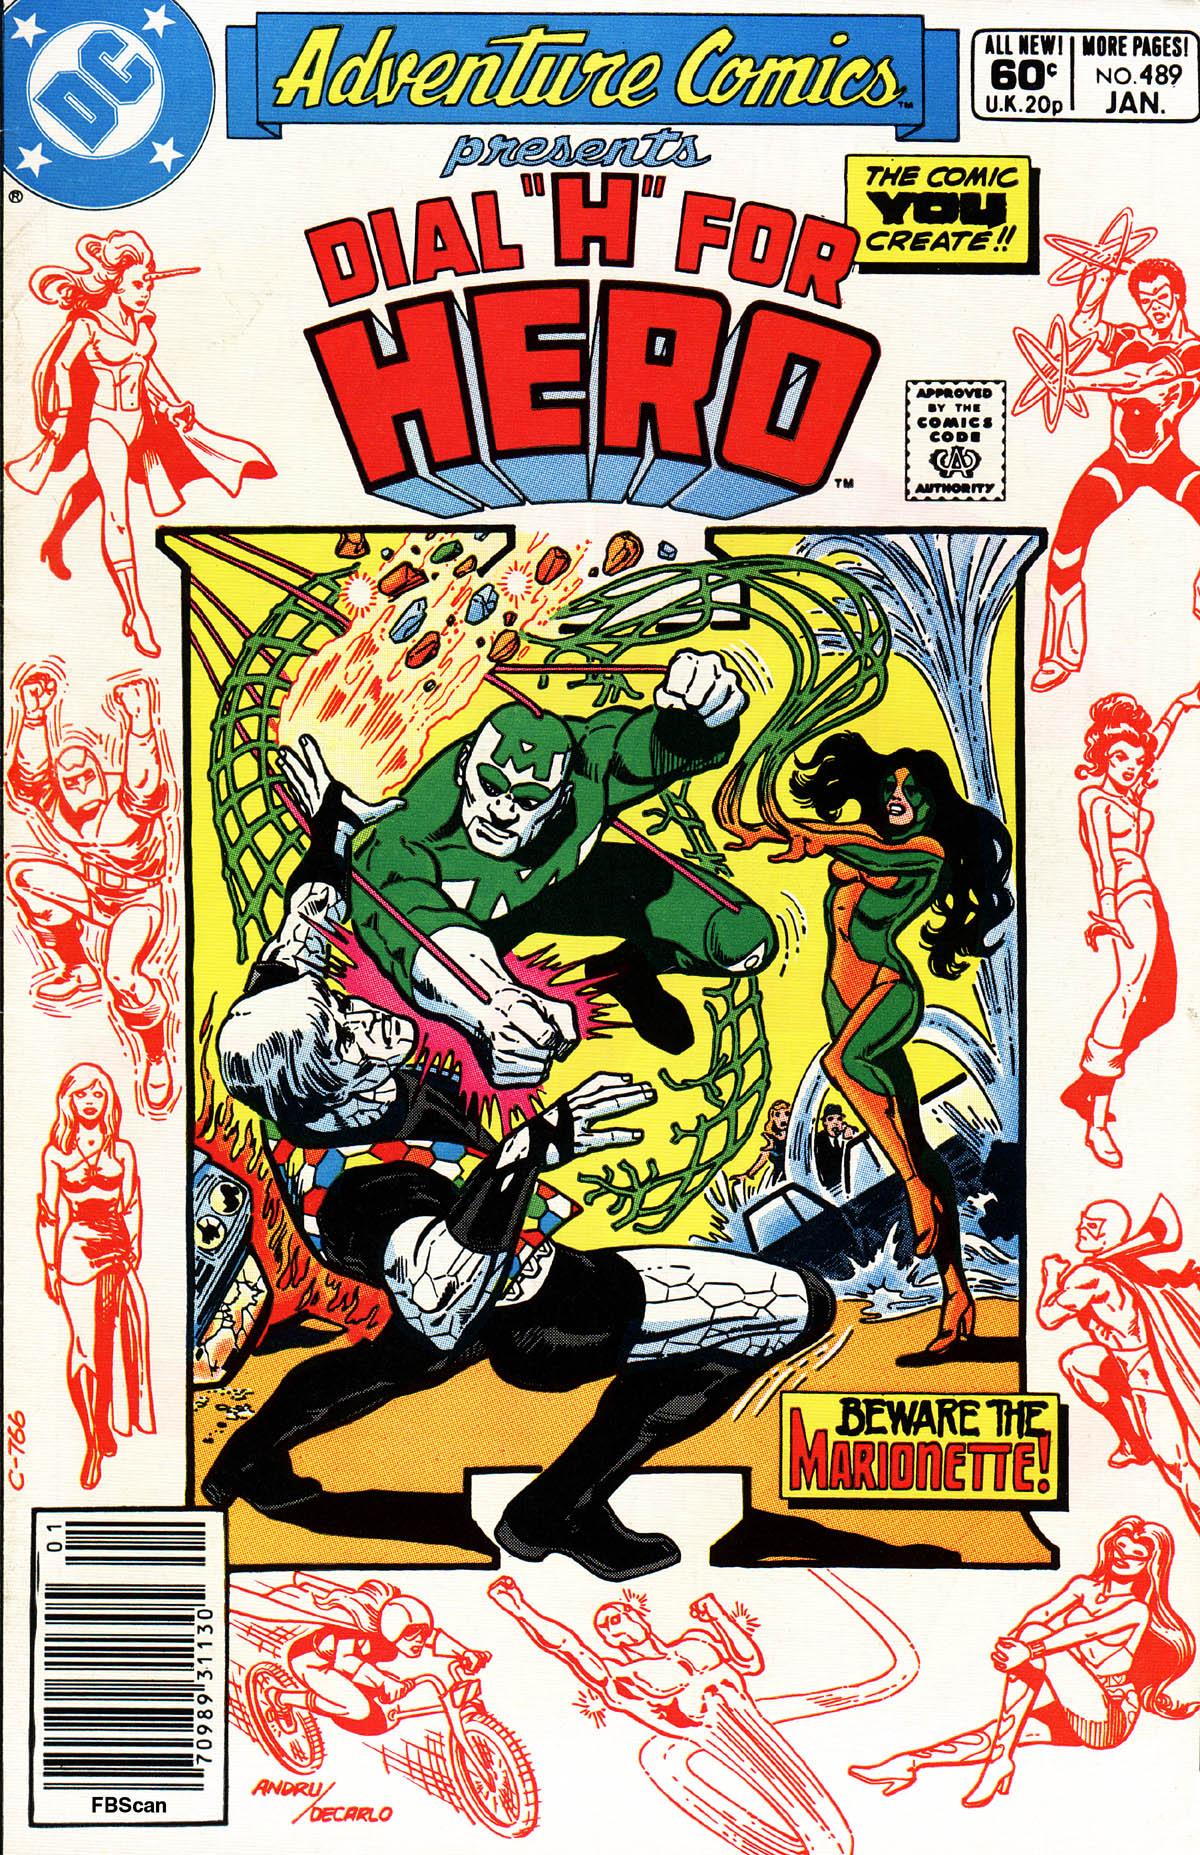 Read online Adventure Comics (1938) comic -  Issue #489 - 1